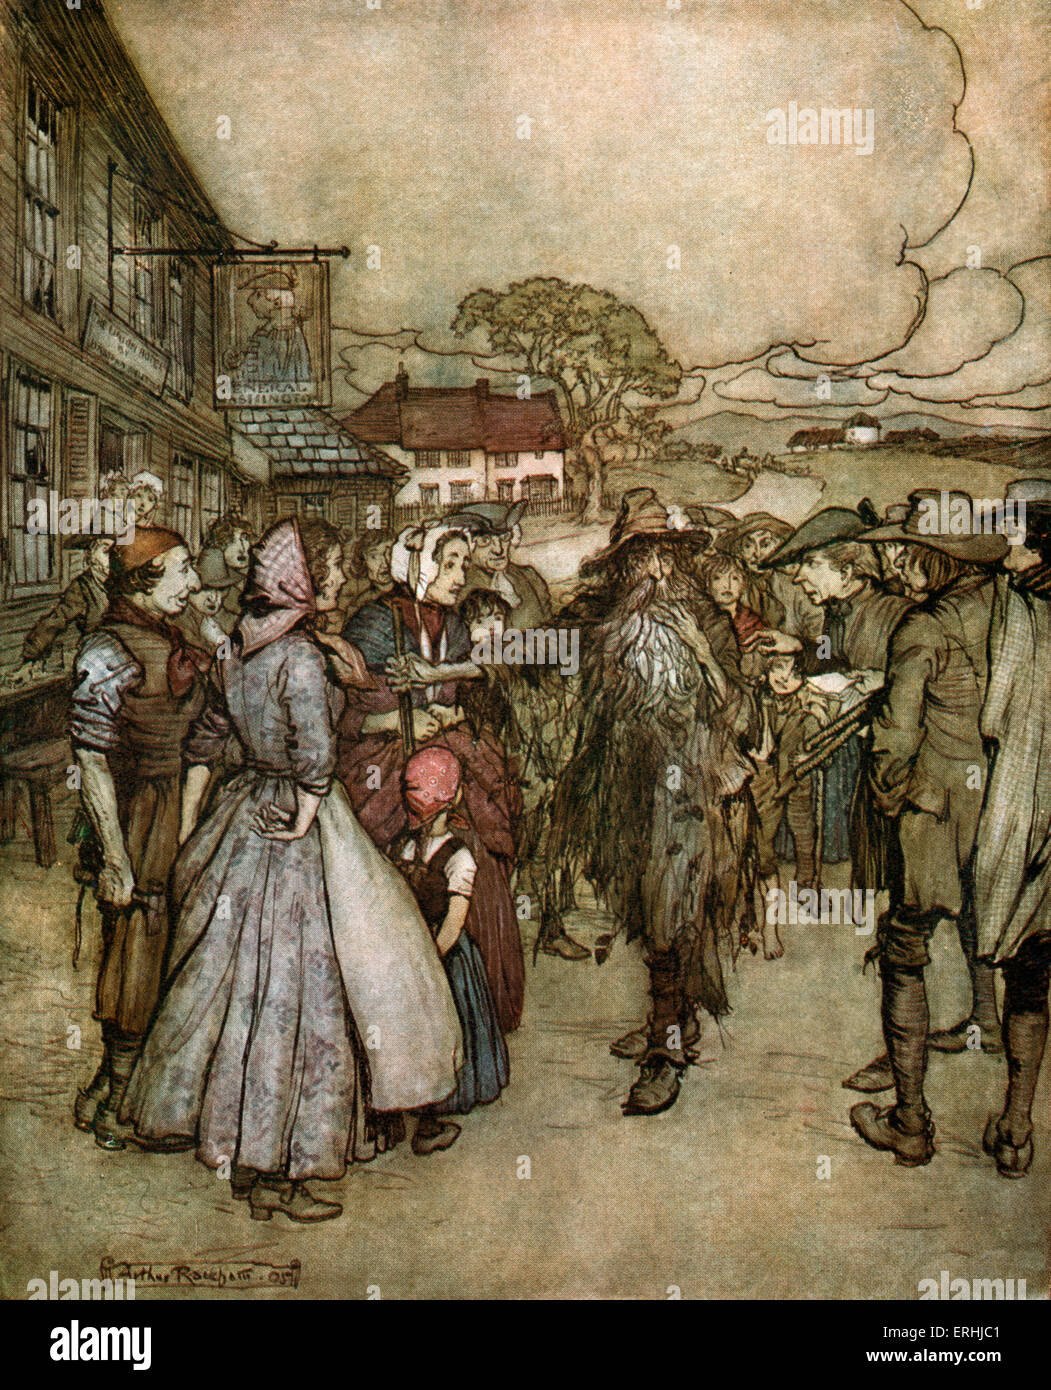 Washington Irving 's short story 'Rip van Winkle' - Illustration by Arthur Rackham, 1904. 'They - Stock Image